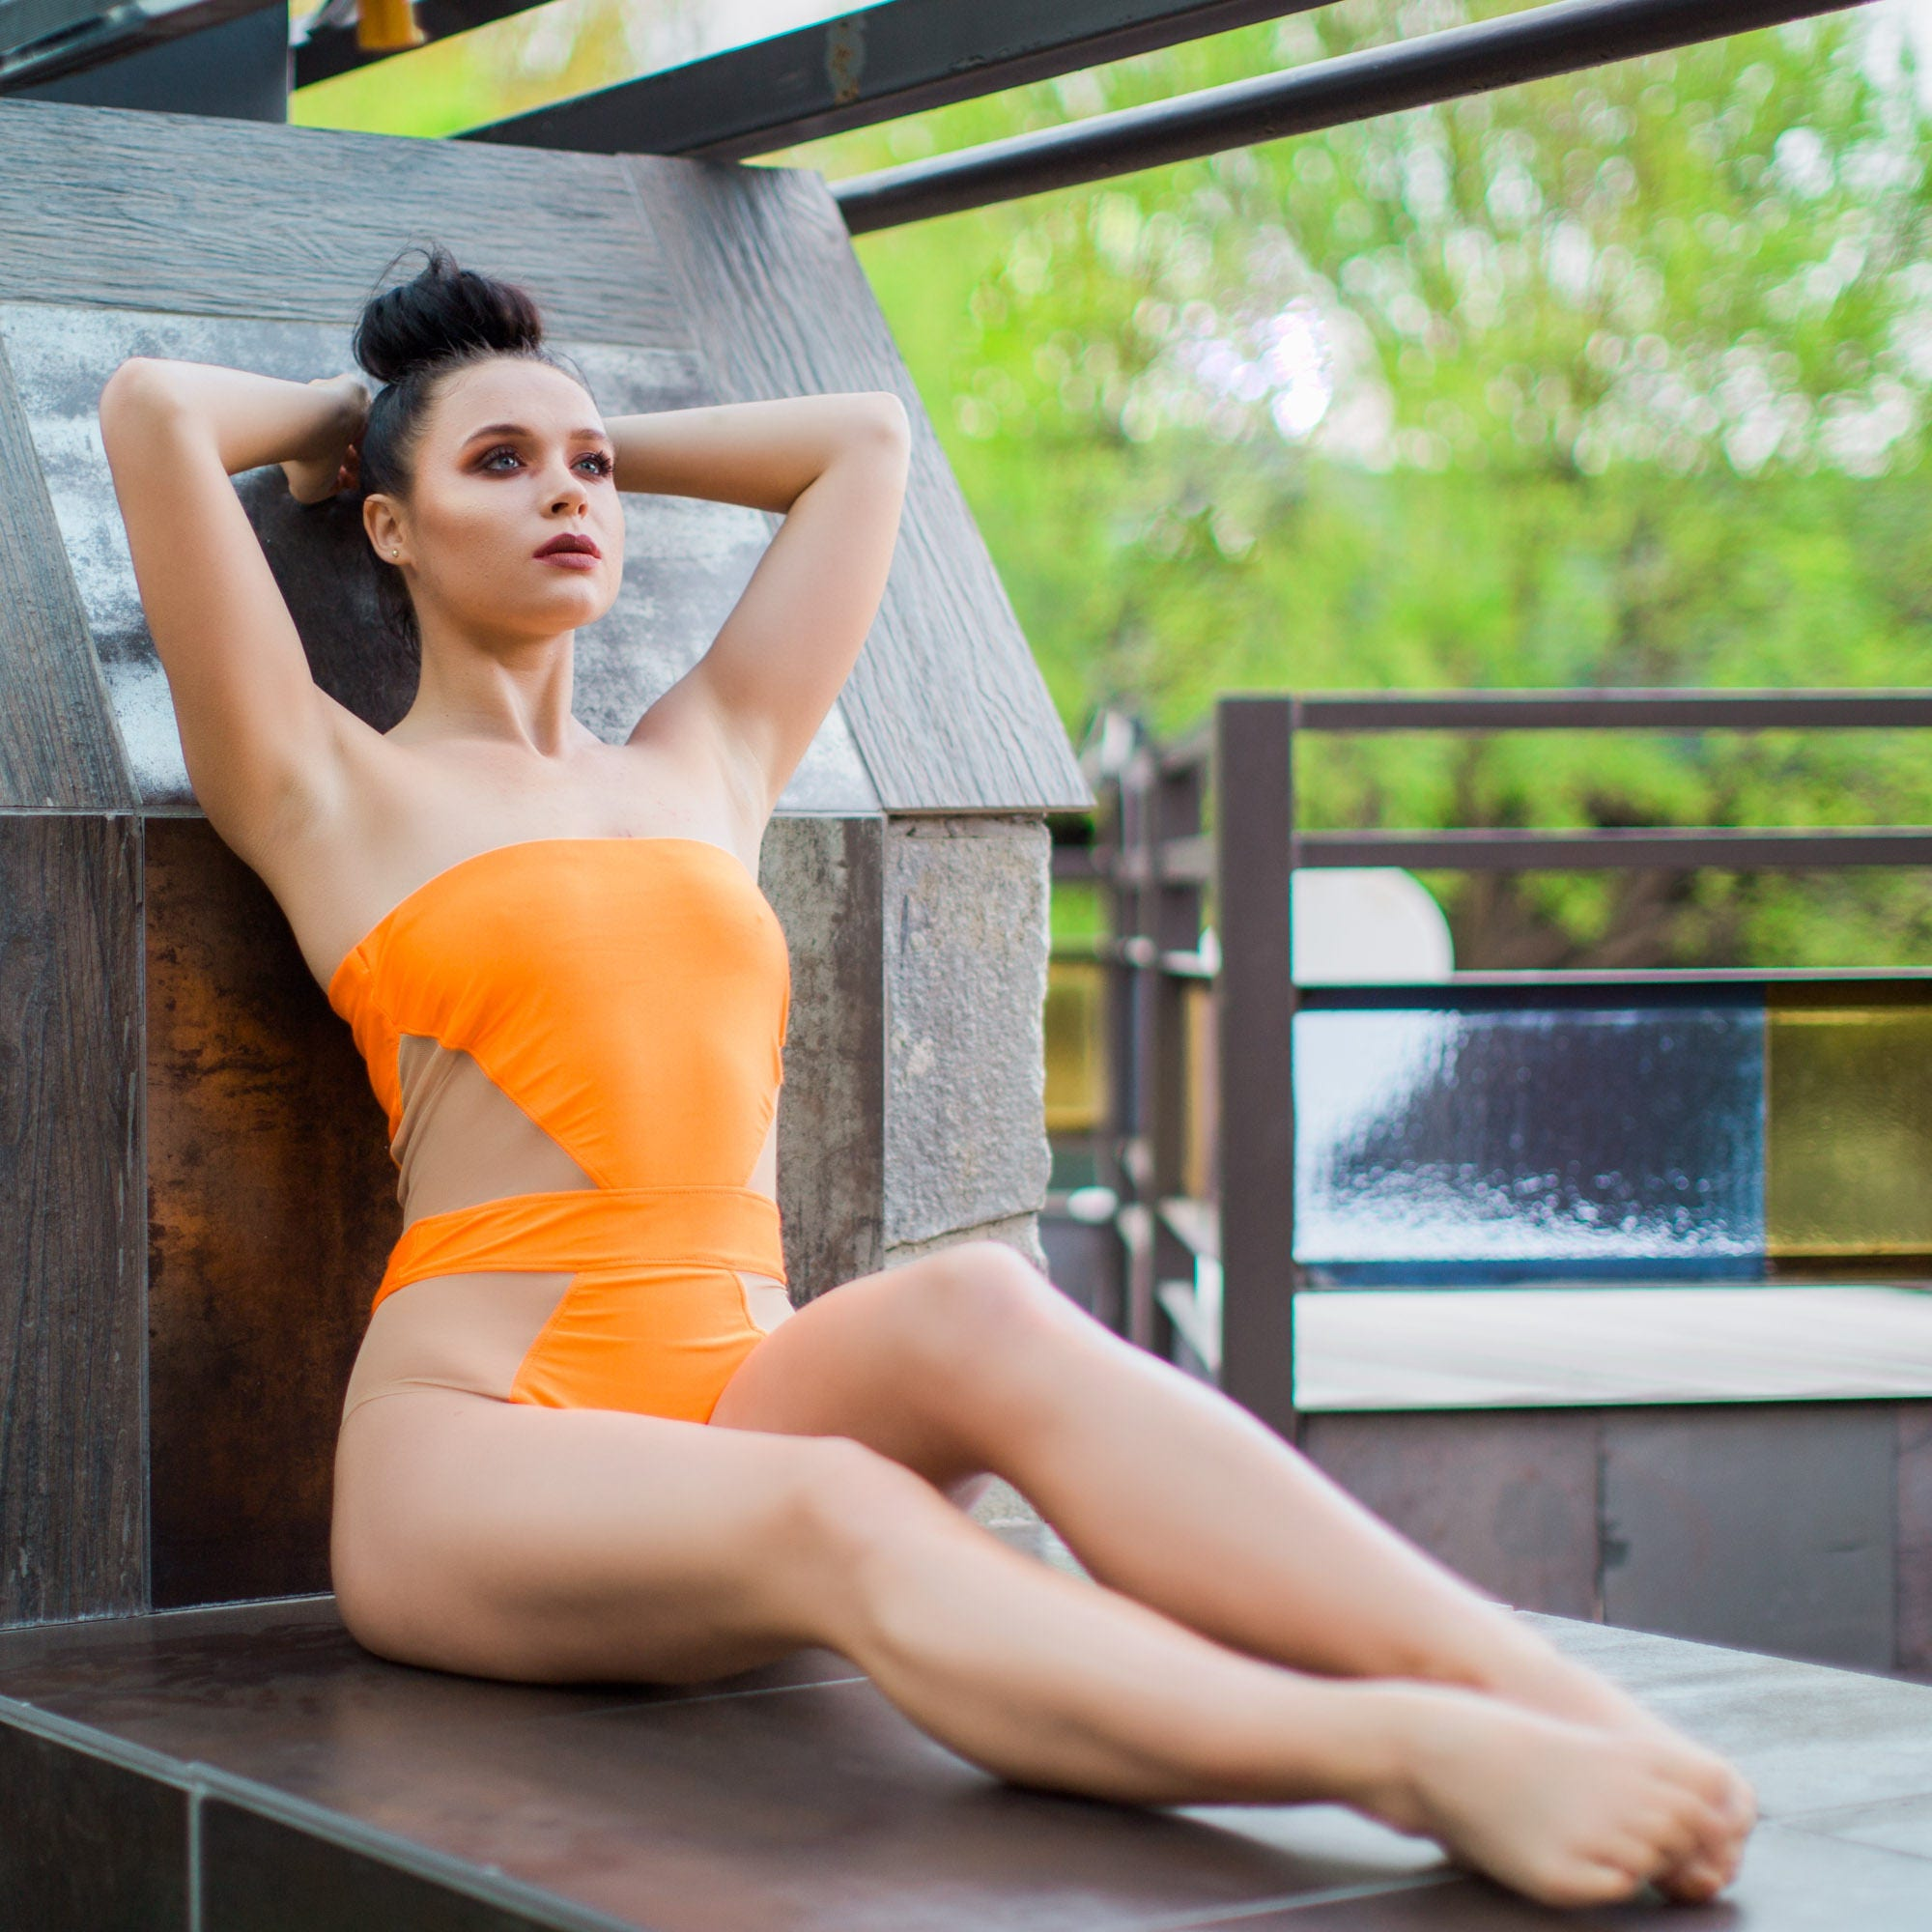 e4789644b8 Diamond Swimsuit Mesh SwimsuitMesh BodysuitBodysuitOne | Etsy